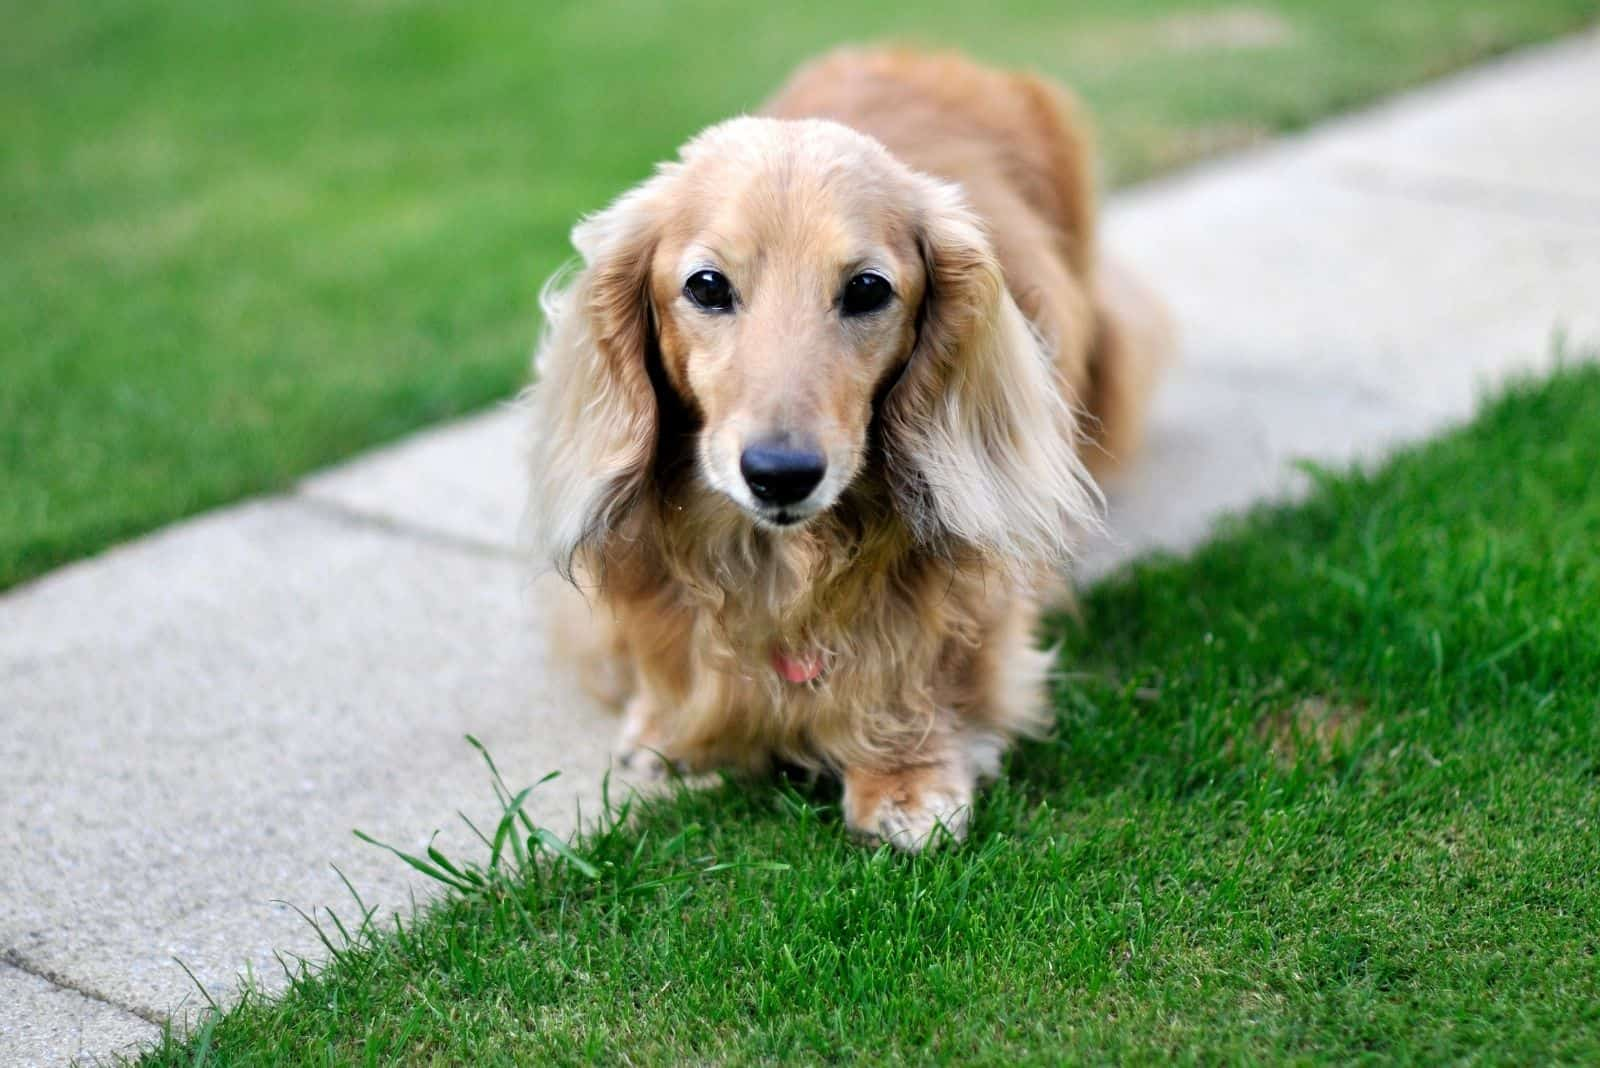 dachshund dog facing